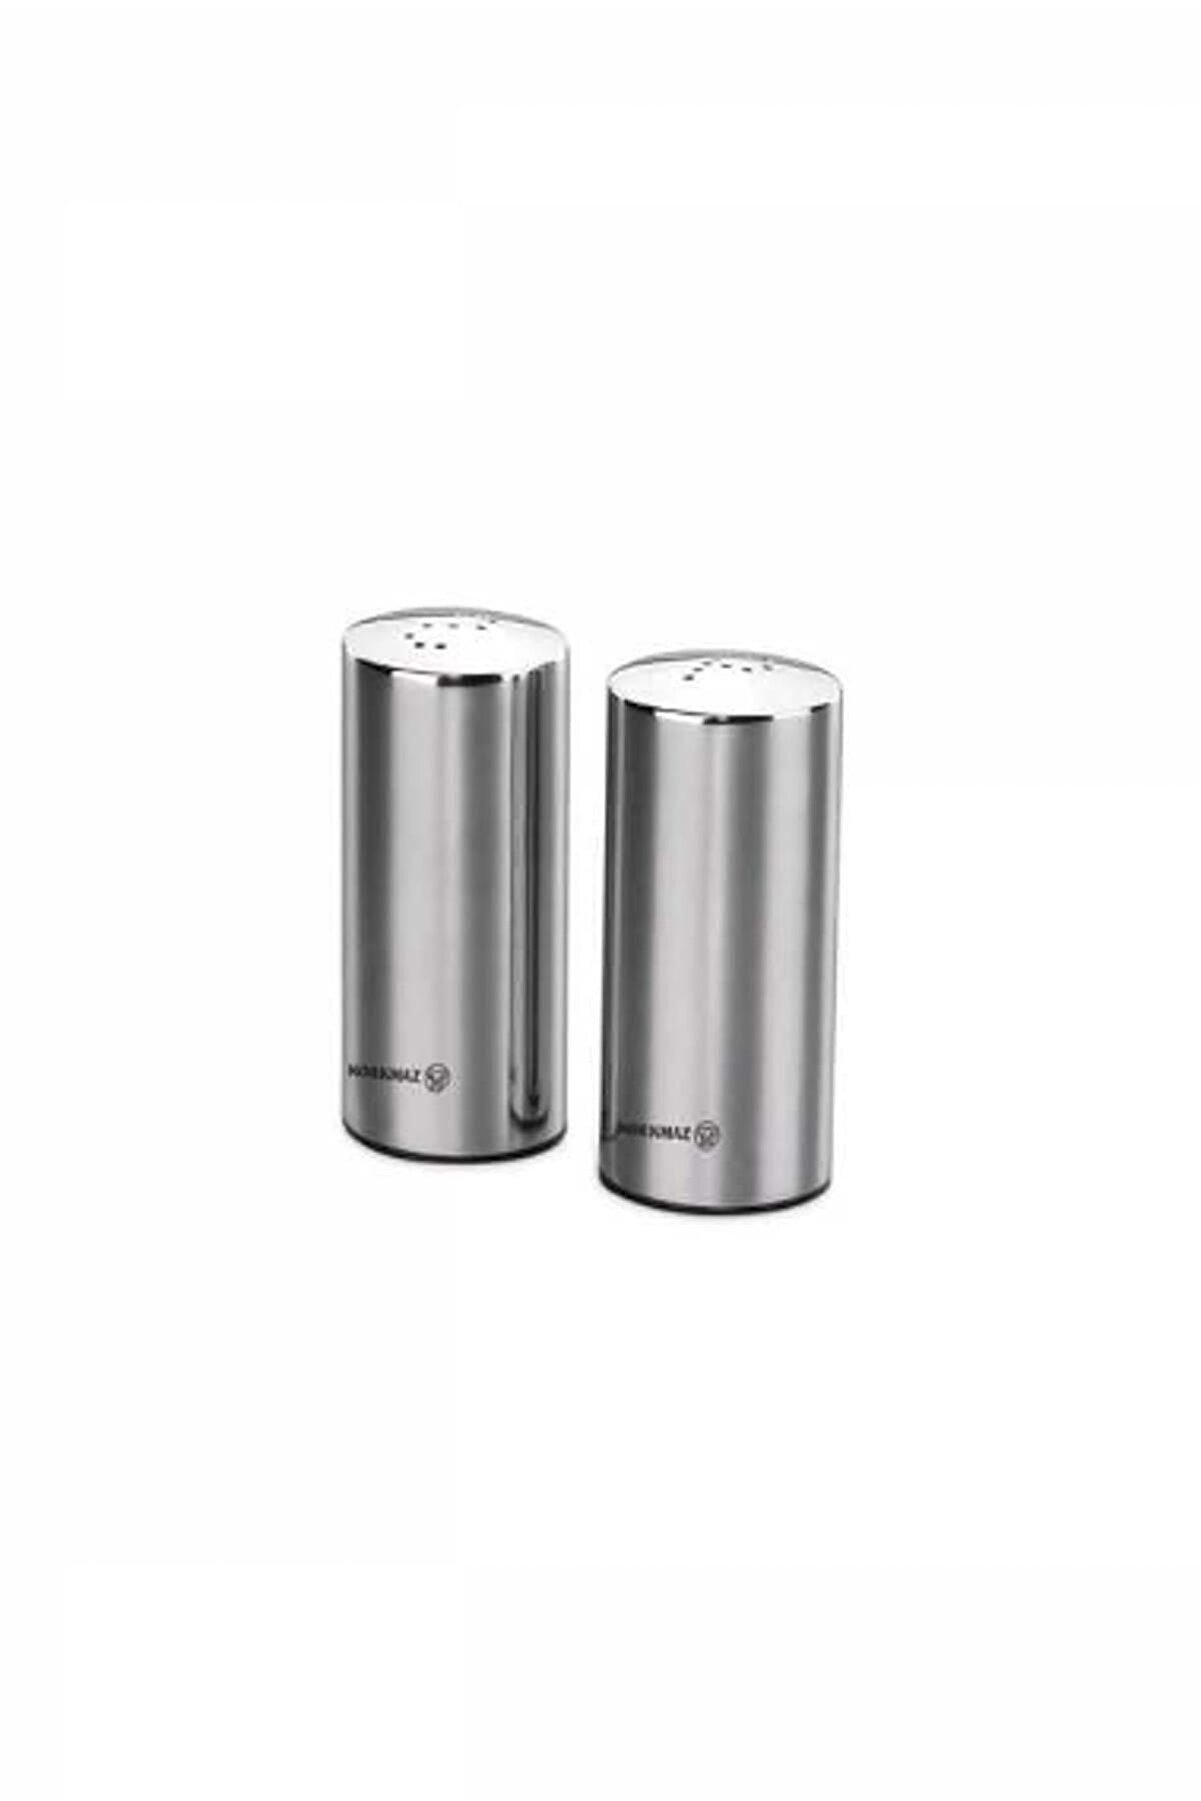 KORKMAZ A602 Duo Tuzluk Biberlik Seti